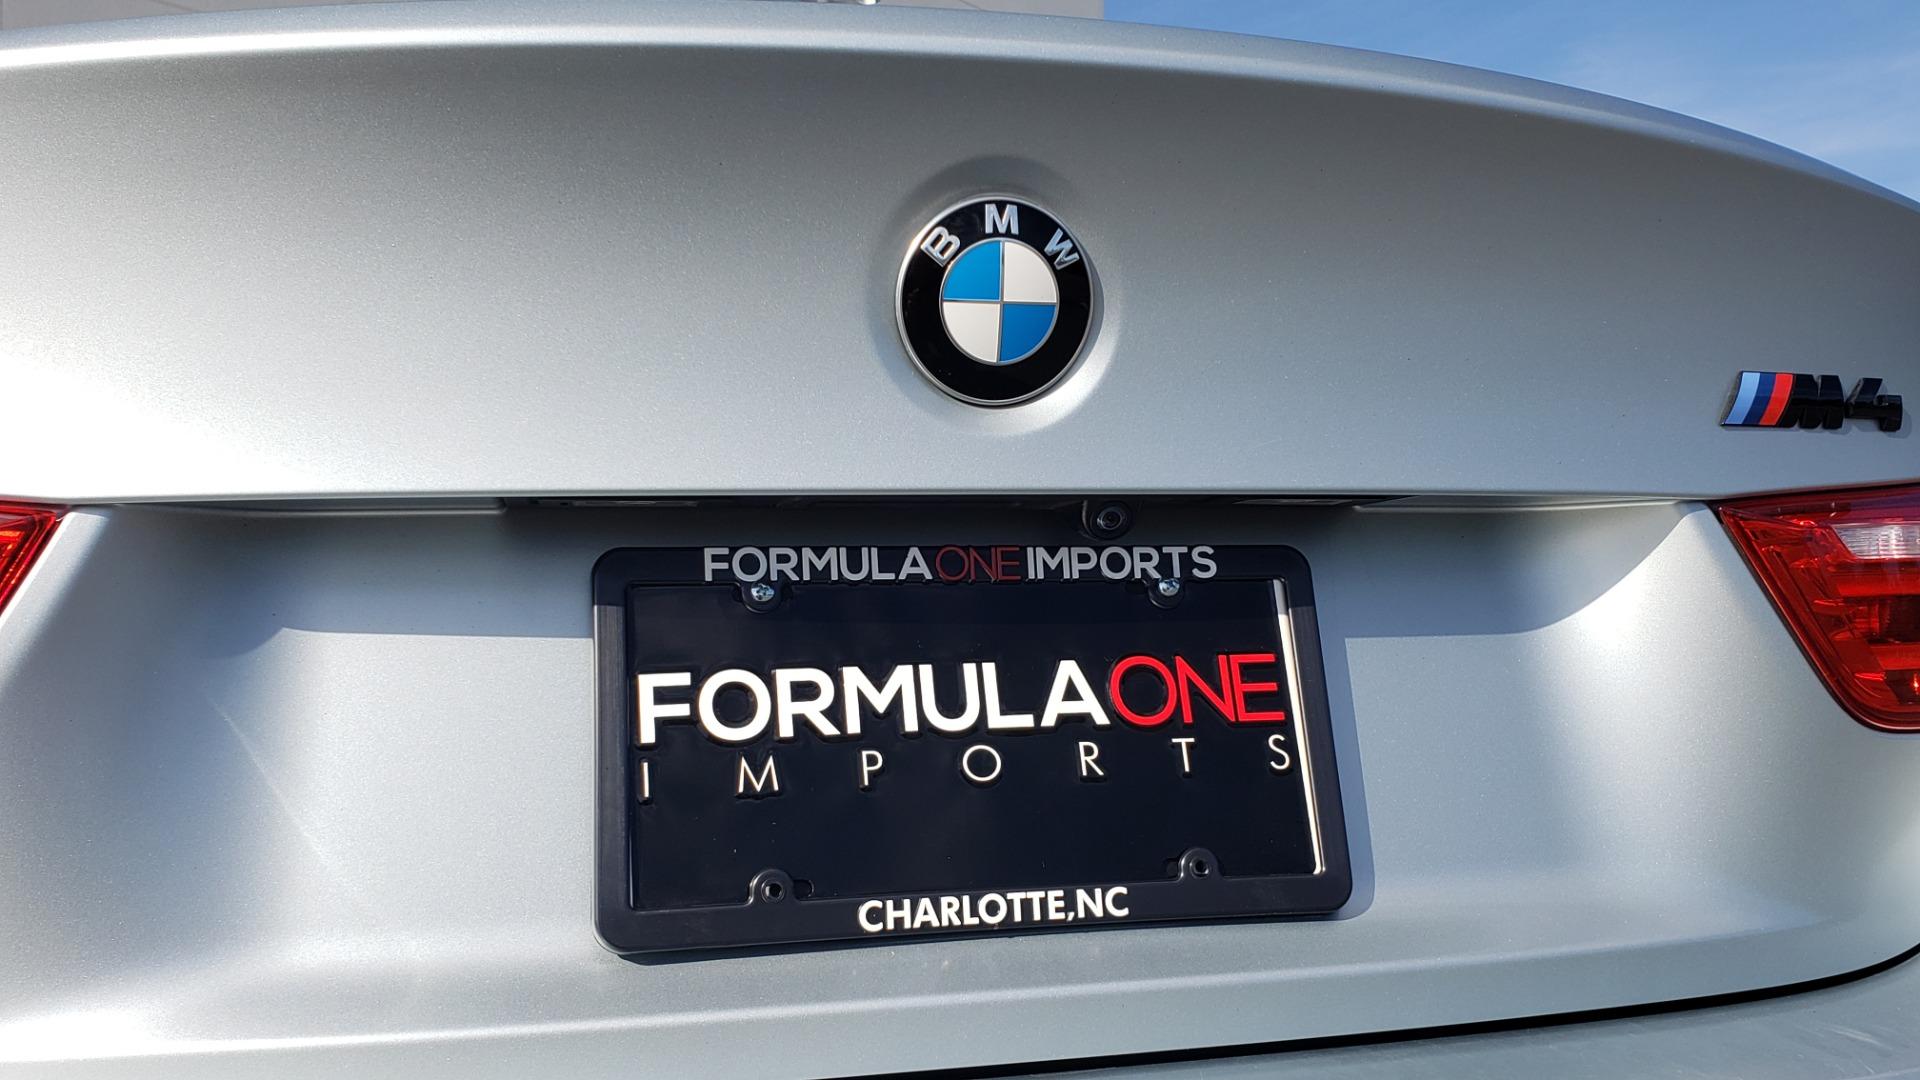 Used 2015 BMW M4 COUPE / EXEC PKG / DRVR ASST PLUS / LIGHTING / M-SUSPENSION for sale Sold at Formula Imports in Charlotte NC 28227 35